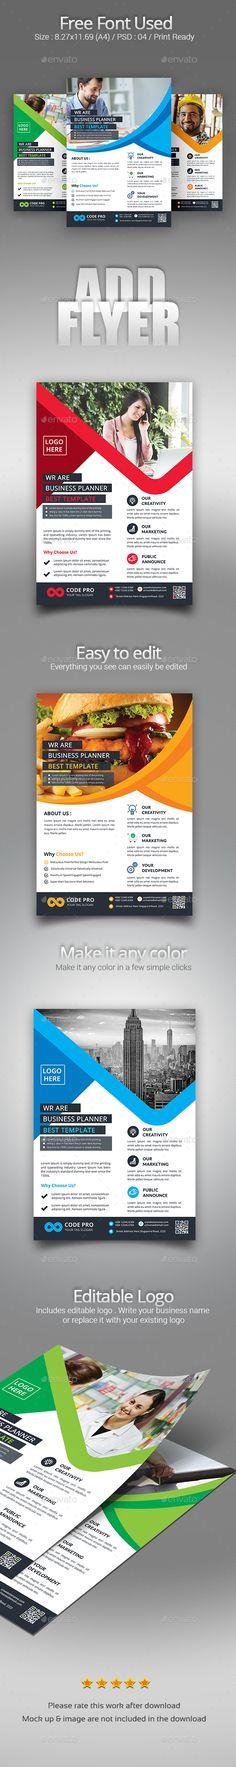 Business Flyer / Ad Template PSD Bundle. Download here: https://graphicriver.net/item/business-flyerad-bundle/17620857?ref=ksioks